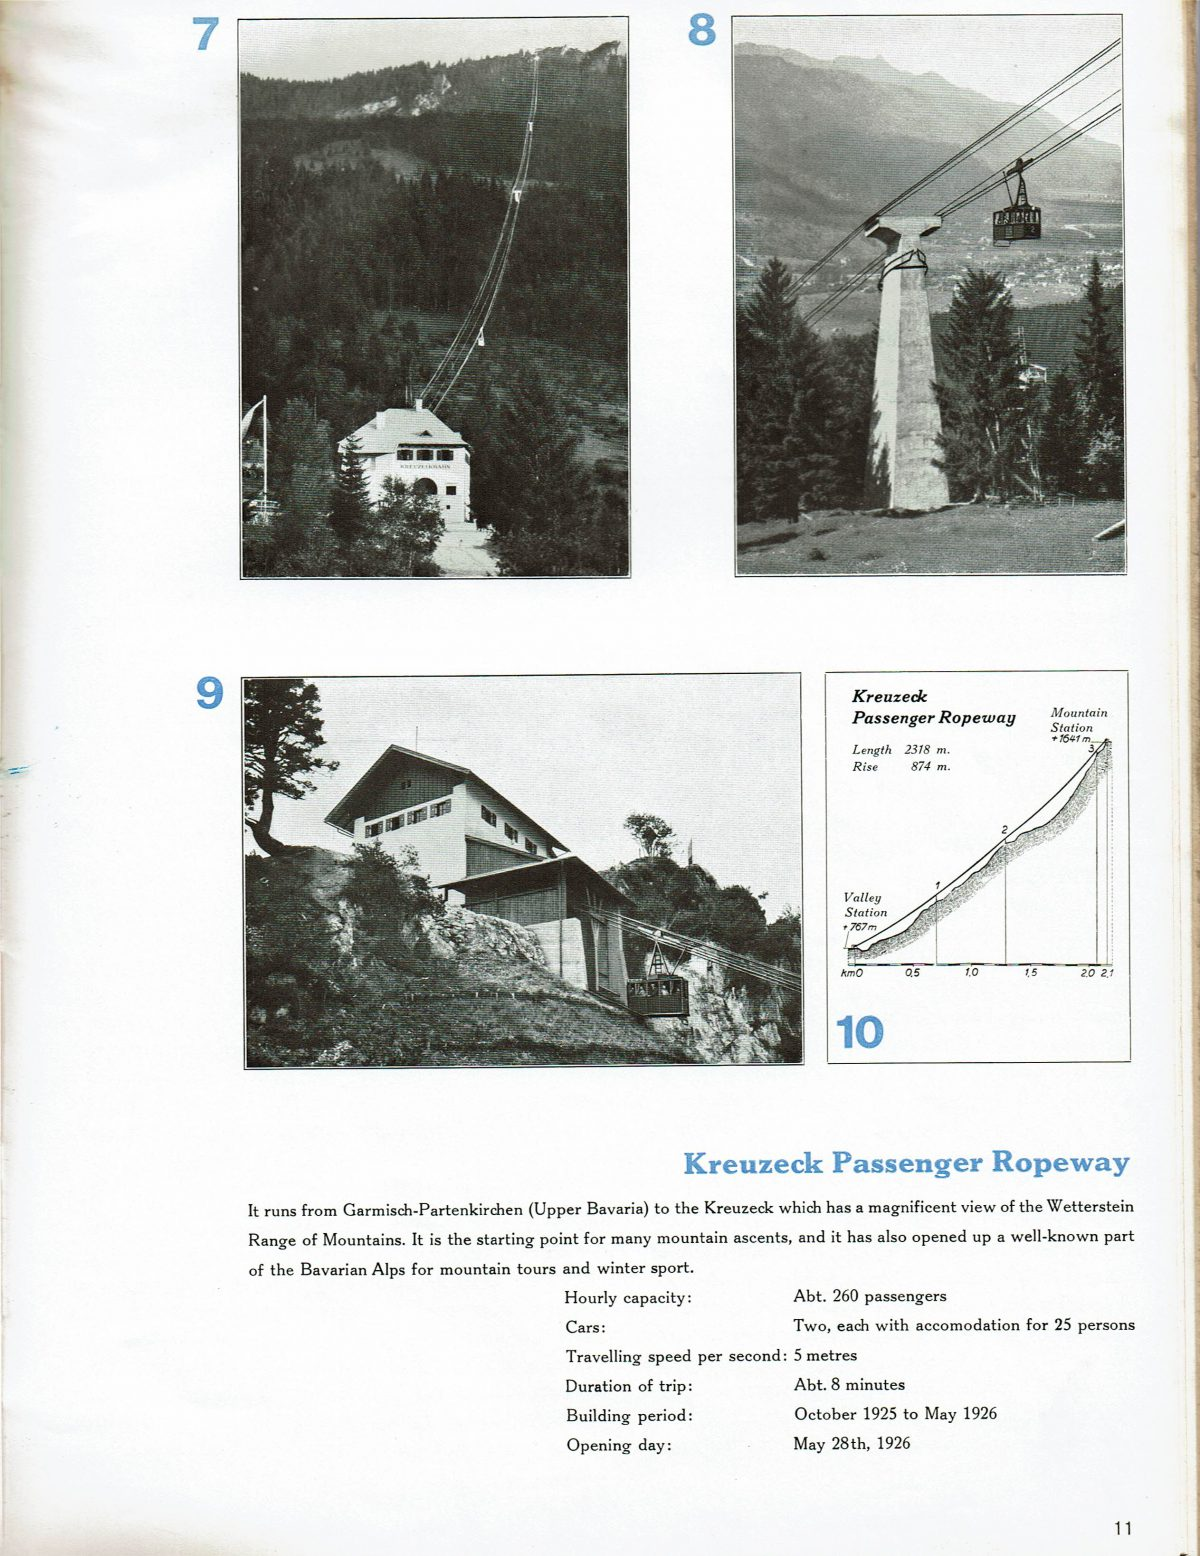 1933 Bleichert Passenger Arial Ropeways 10